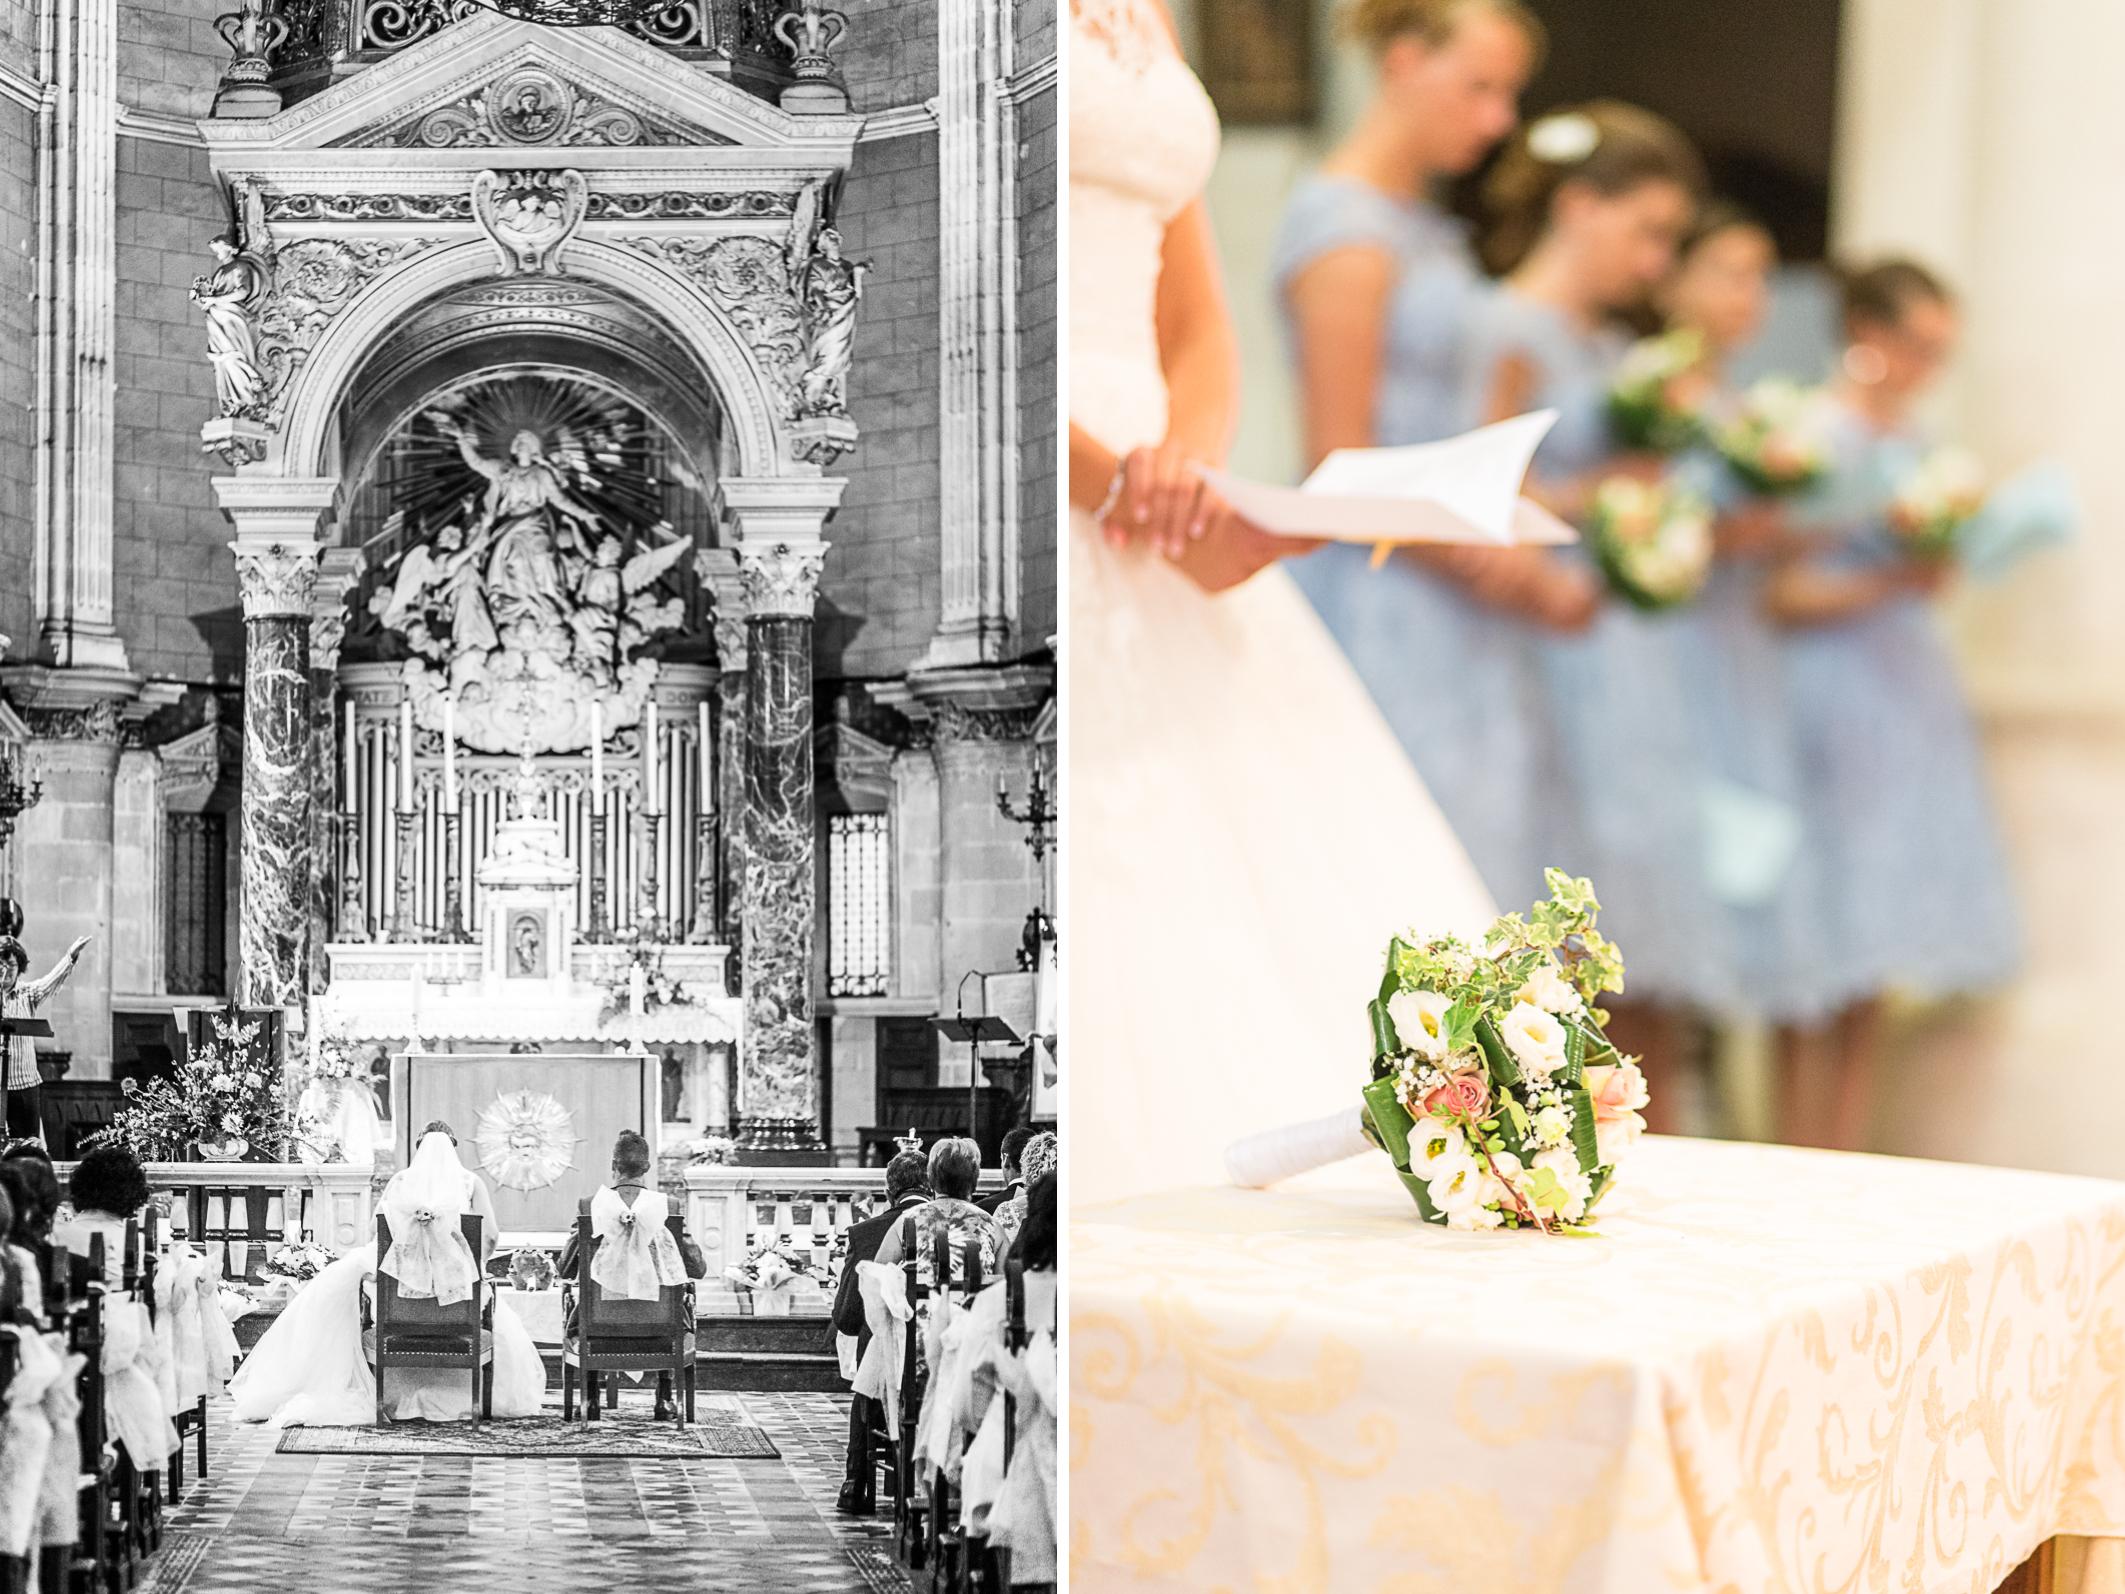 mariage_salorge_a_et_f-cedric-derrien_026-1